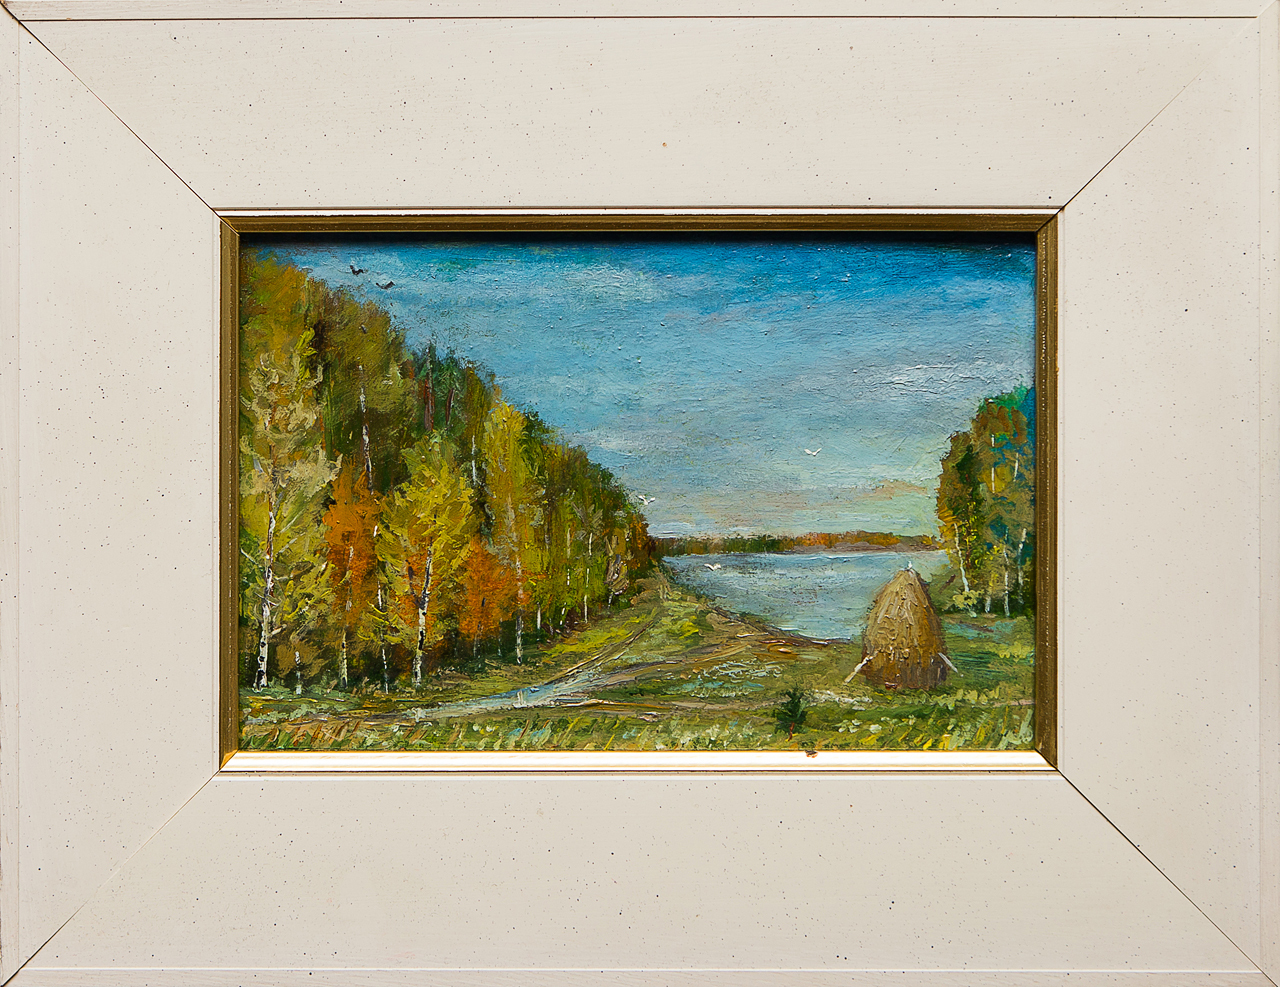 Картина маслом Возле озера Мифтахов картина маслом подсолнухи мифтахов